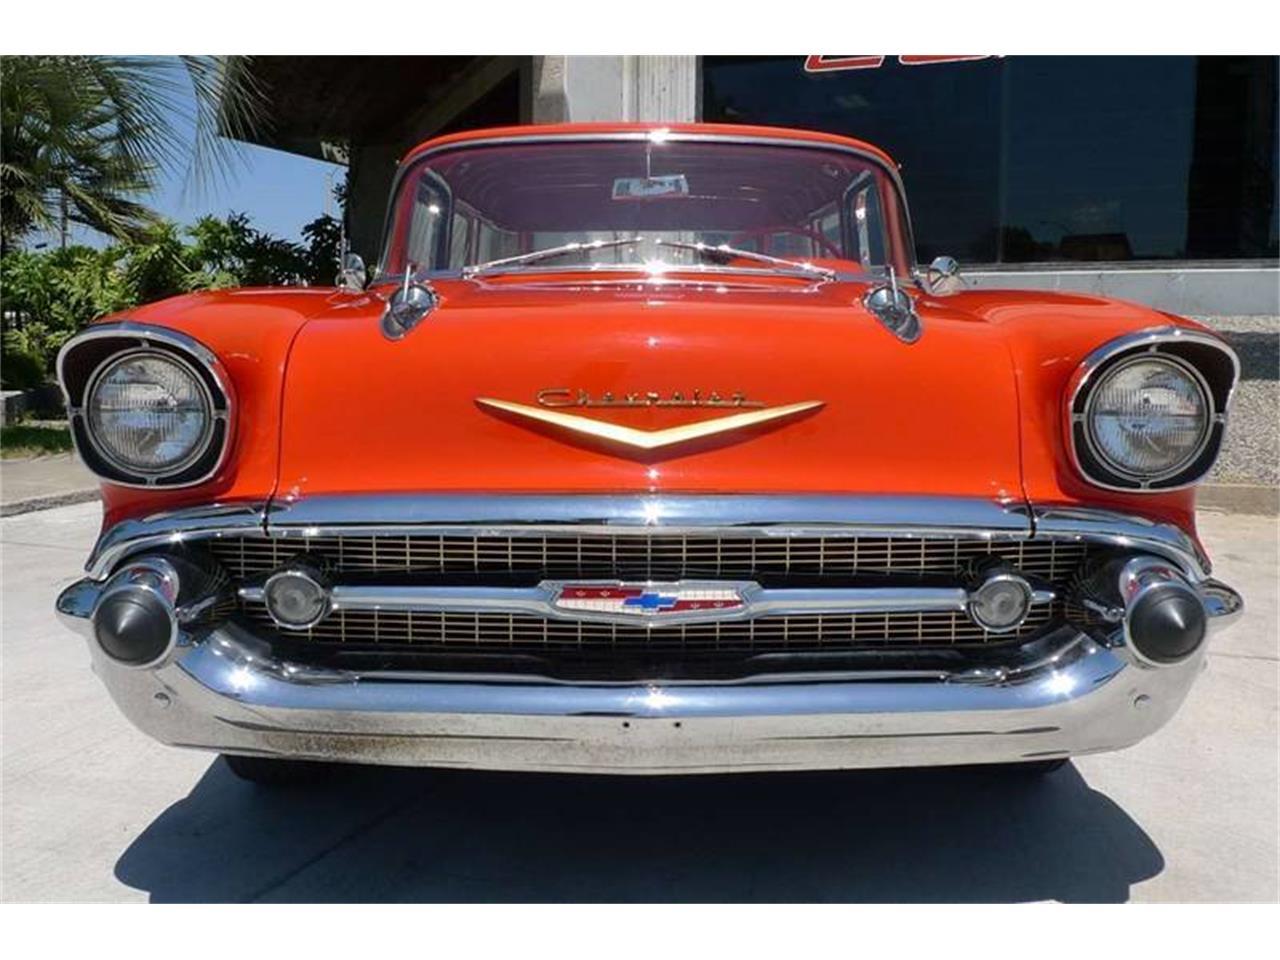 1957 Chevrolet Bel Air Nomad (CC-1247381) for sale in Brea, California